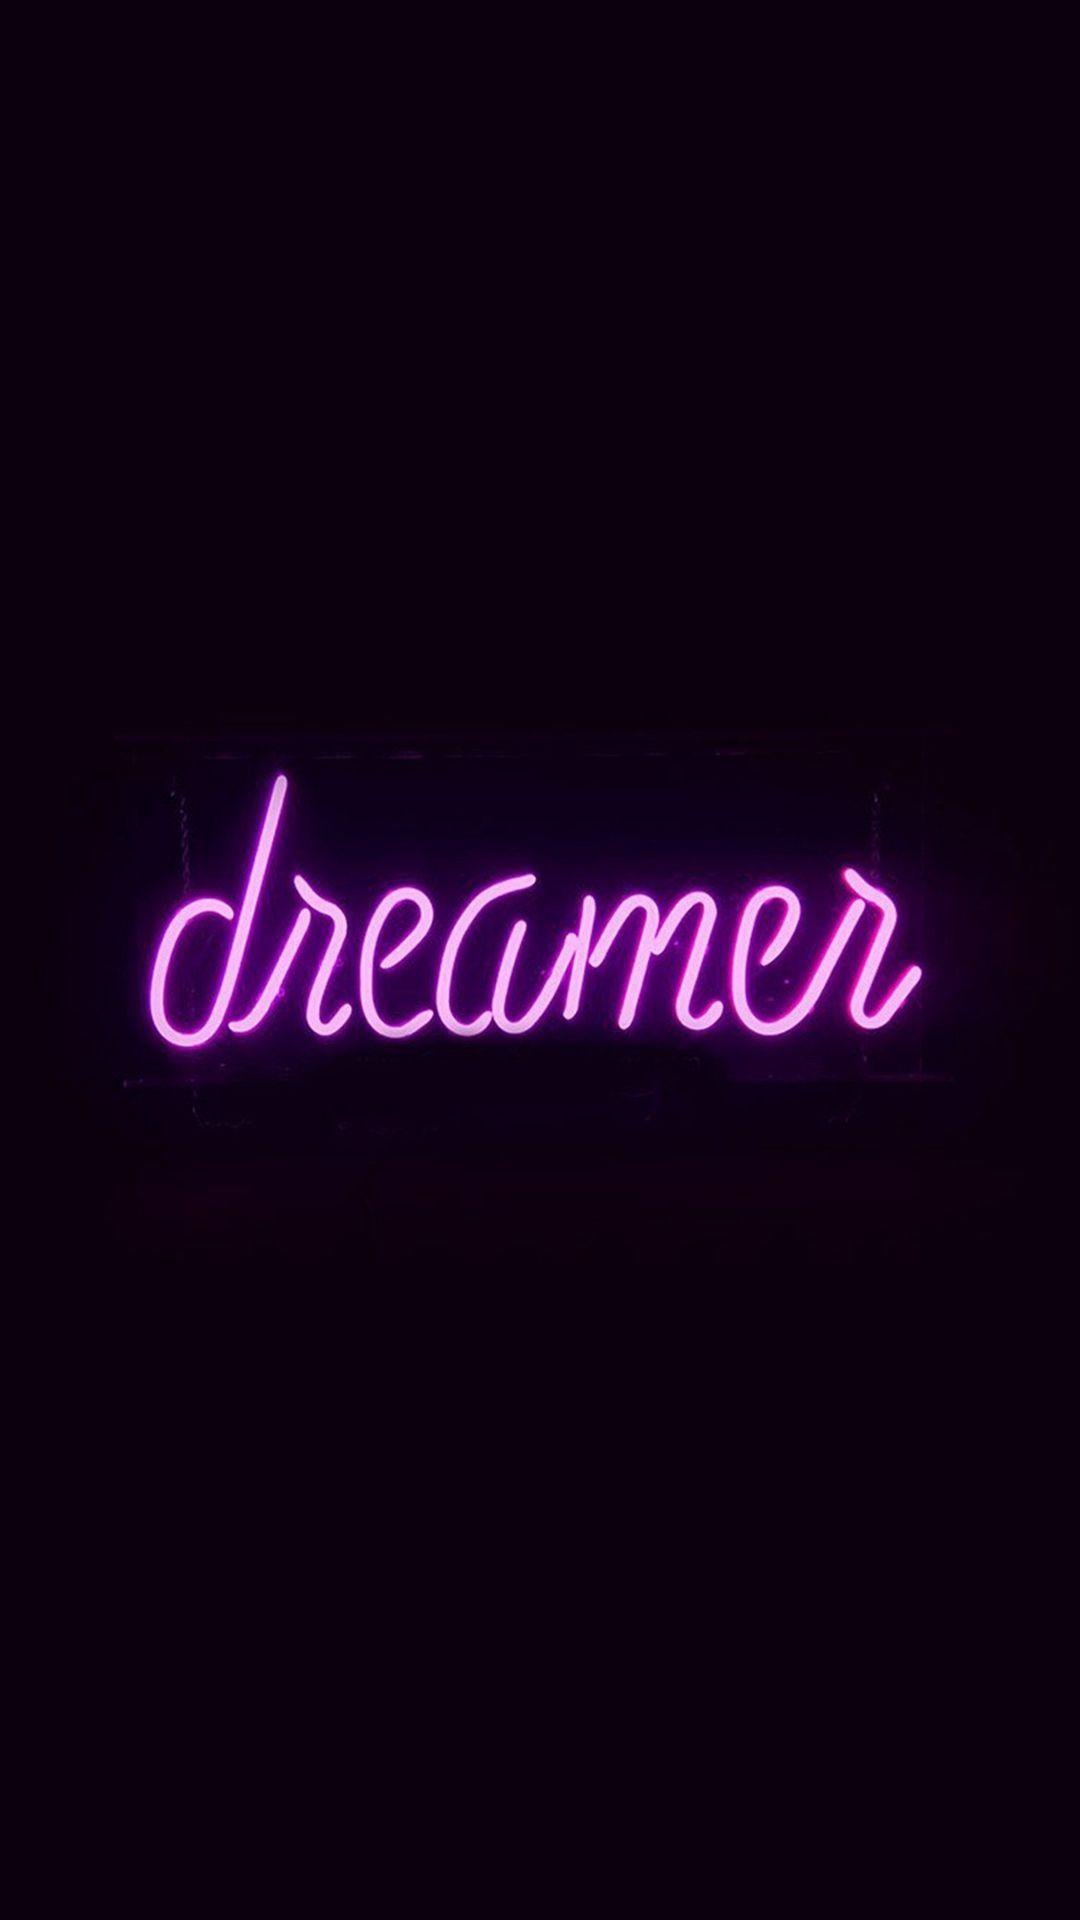 Https All Images Net Aesthetic Alternative Wallpaper Awesome Dreamers Neon Sign Dark Illustratio Neon Wallpaper Purple Wallpaper Iphone Dark Purple Aesthetic